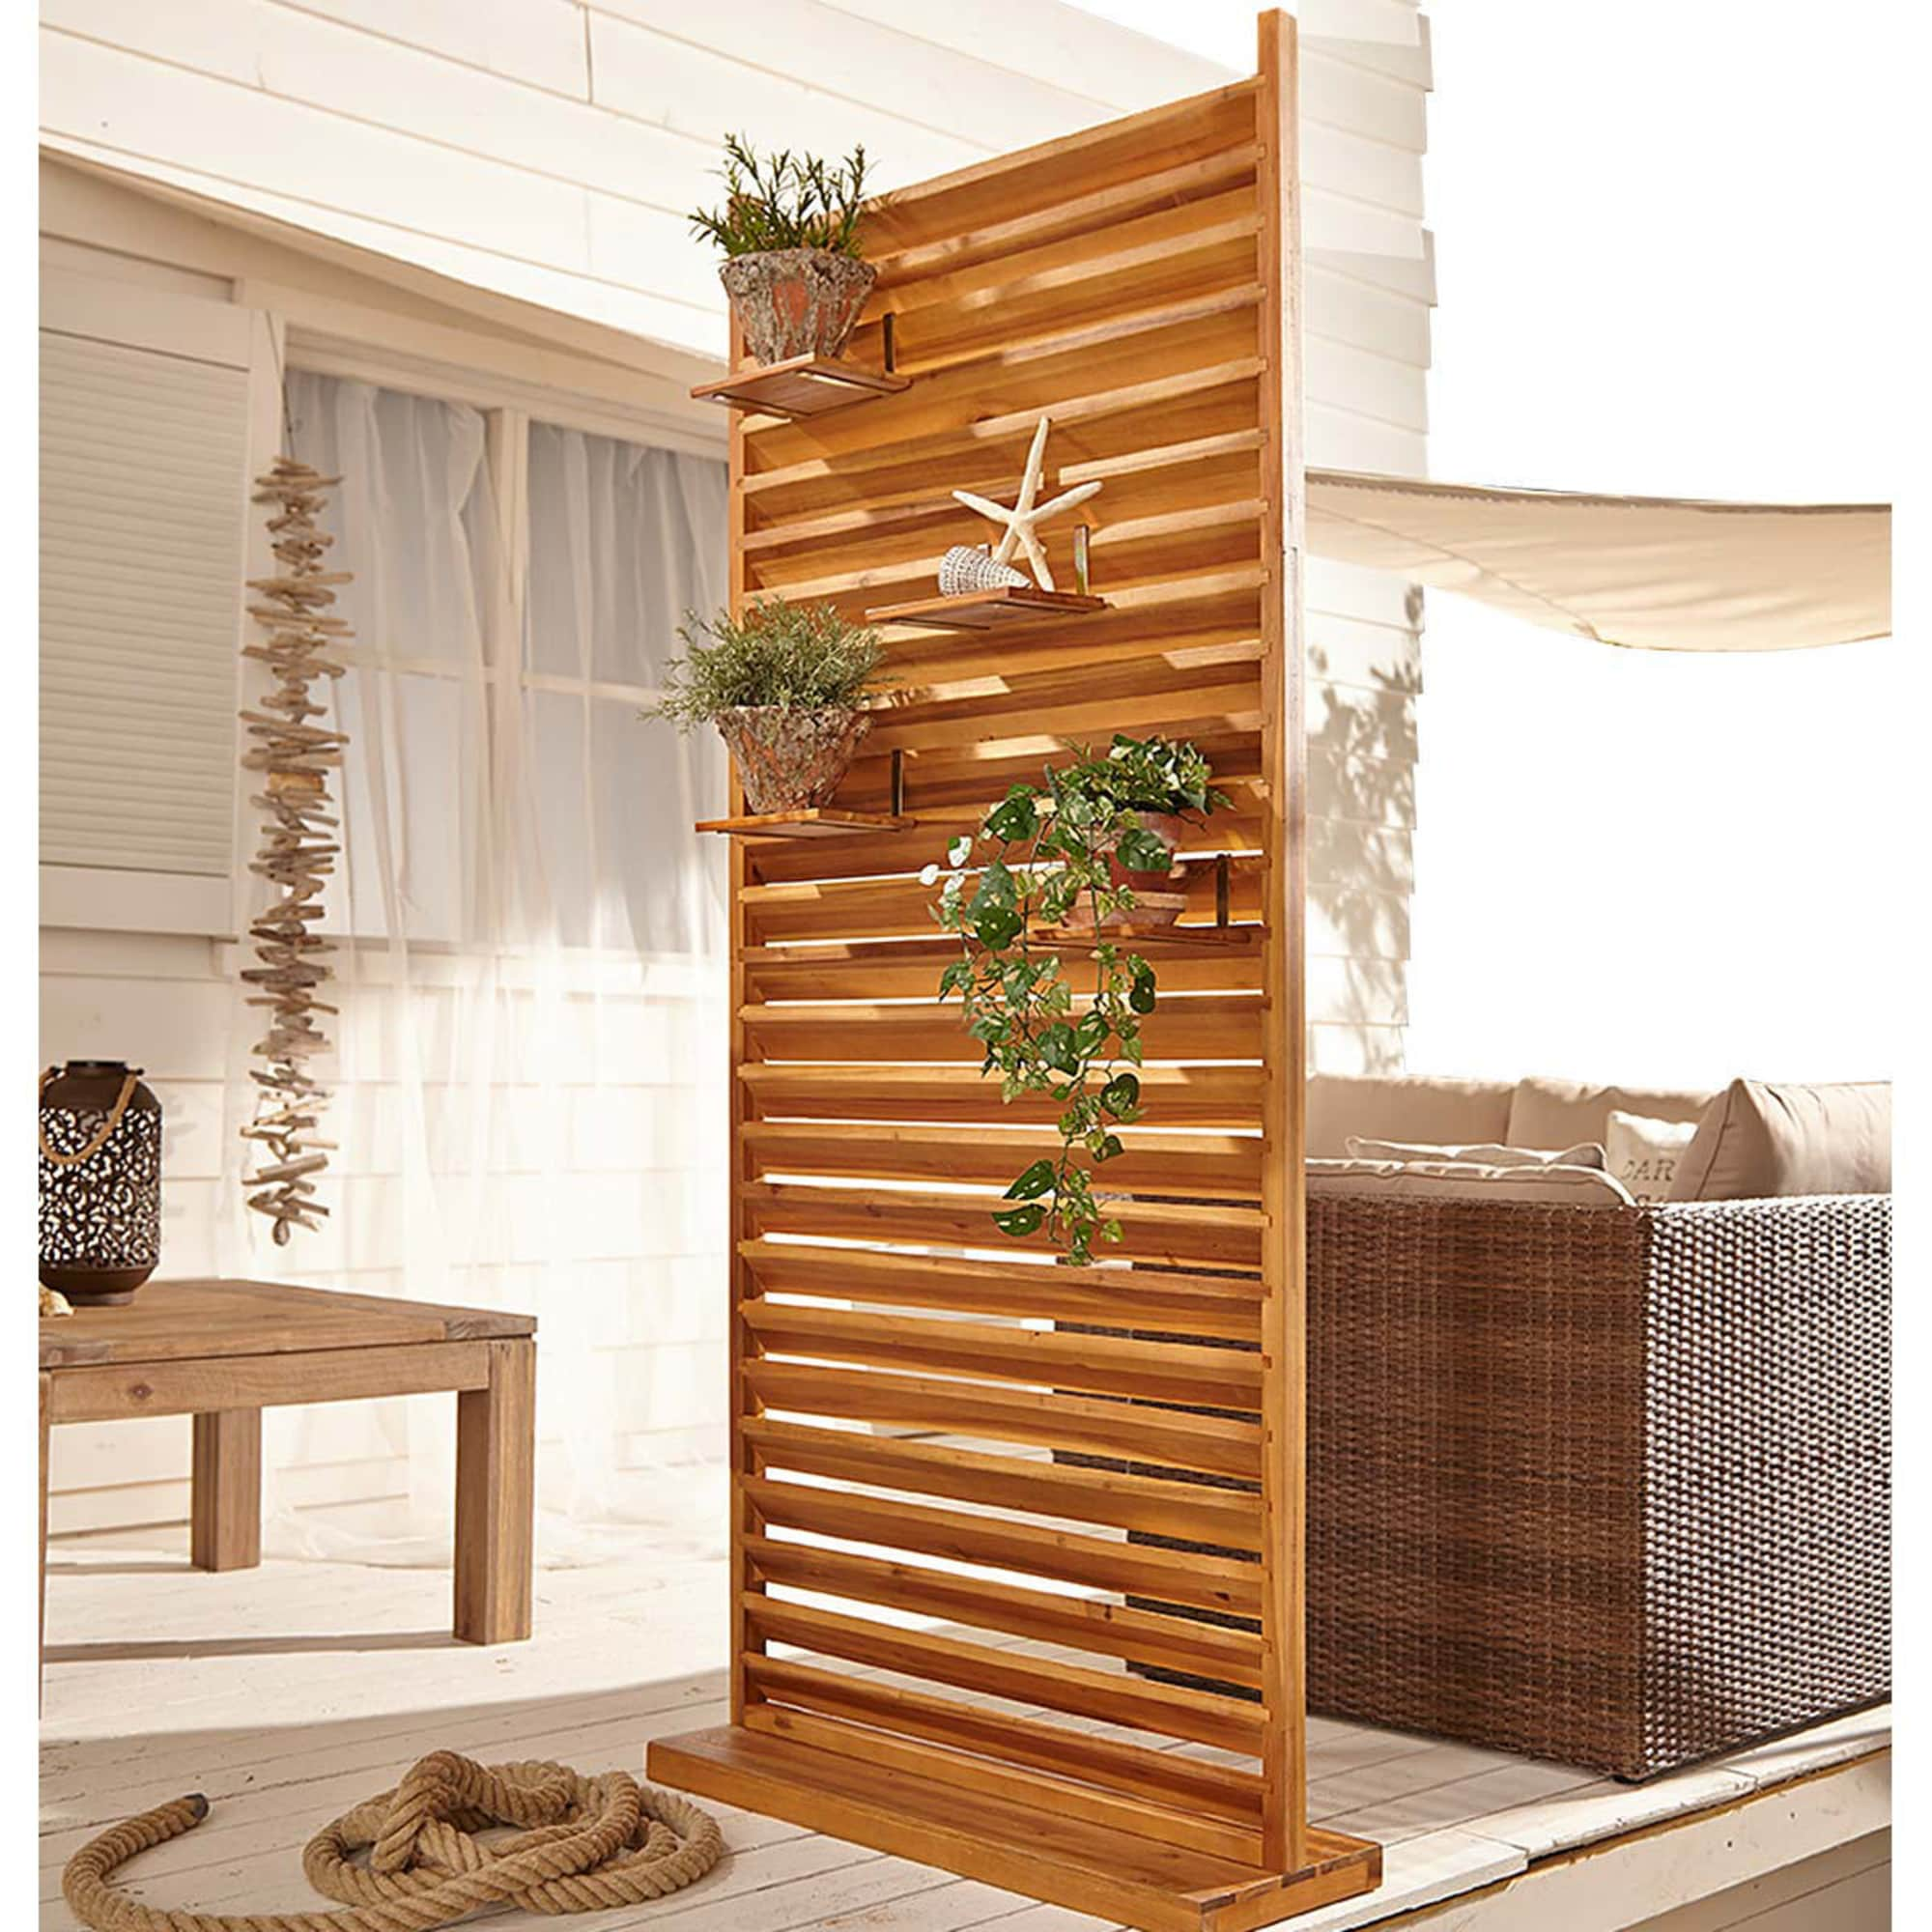 Outdoor Sichtschutz, groß Lamellen, quergelattete Lamellen, Akazienholz,  ca. B20 x T20 x H120 cm